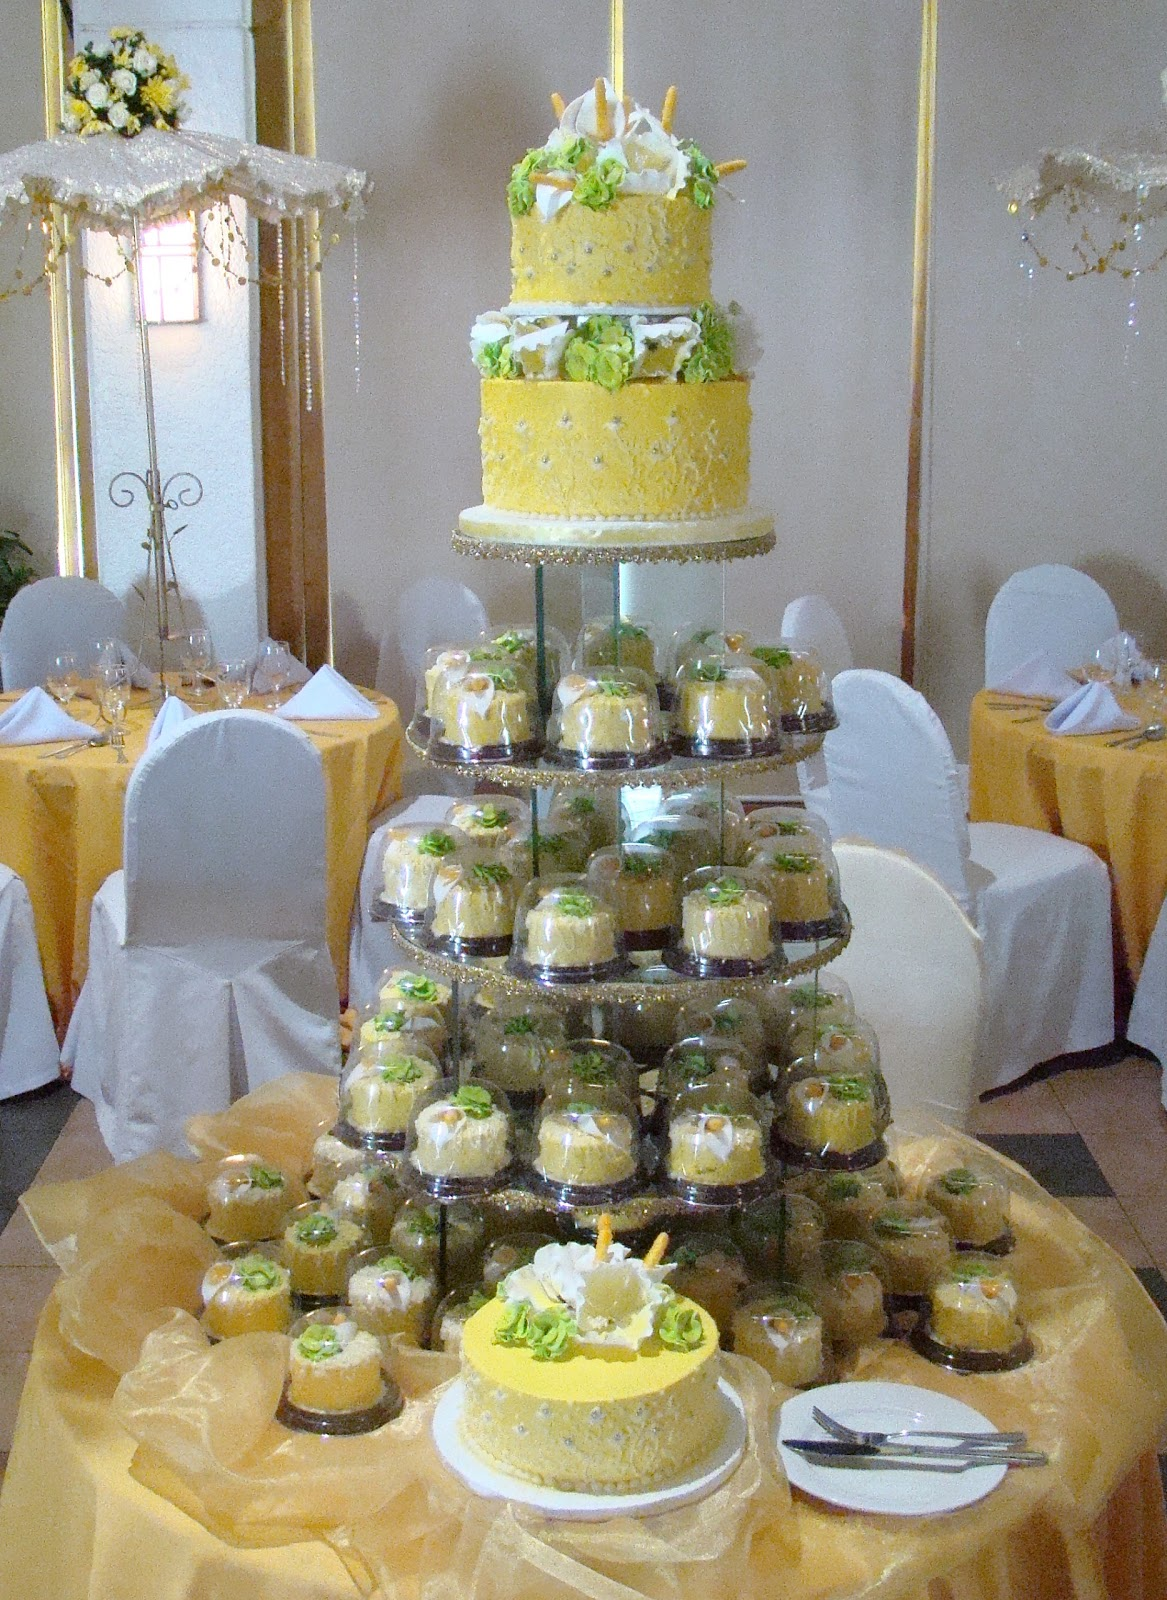 Birthday Cakes In Angeles City Pampanga